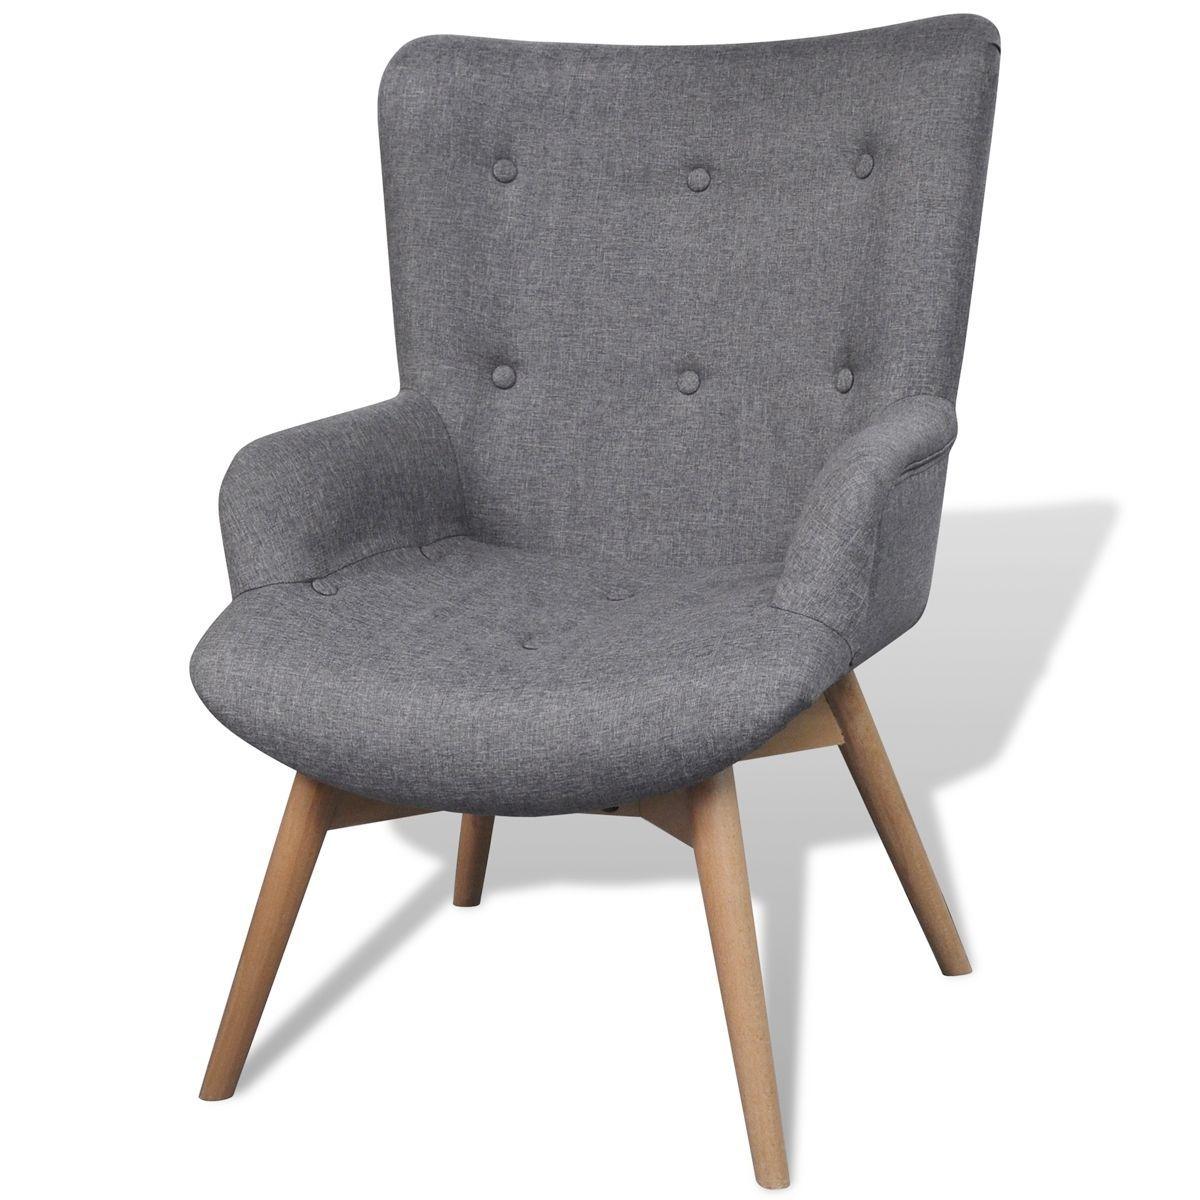 Lounge sessel retro  Details zu vidaXL TV-Fernsehsessel Relaxsessel Armsessel ...